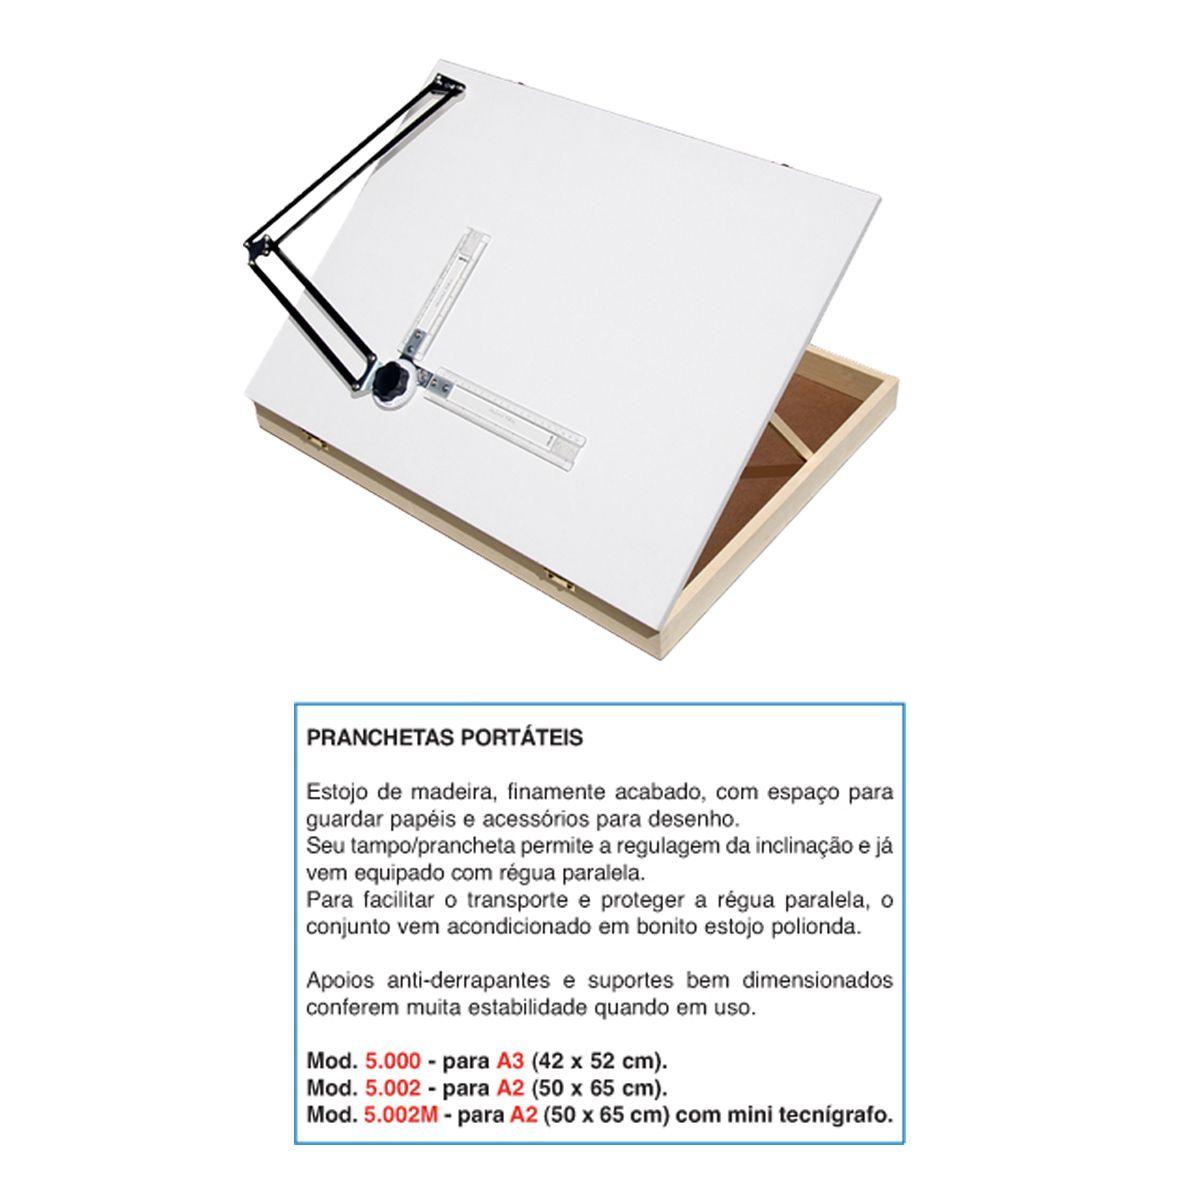 Prancheta Portátil Trident c/ Mini Tecnígrafo A2 5002M